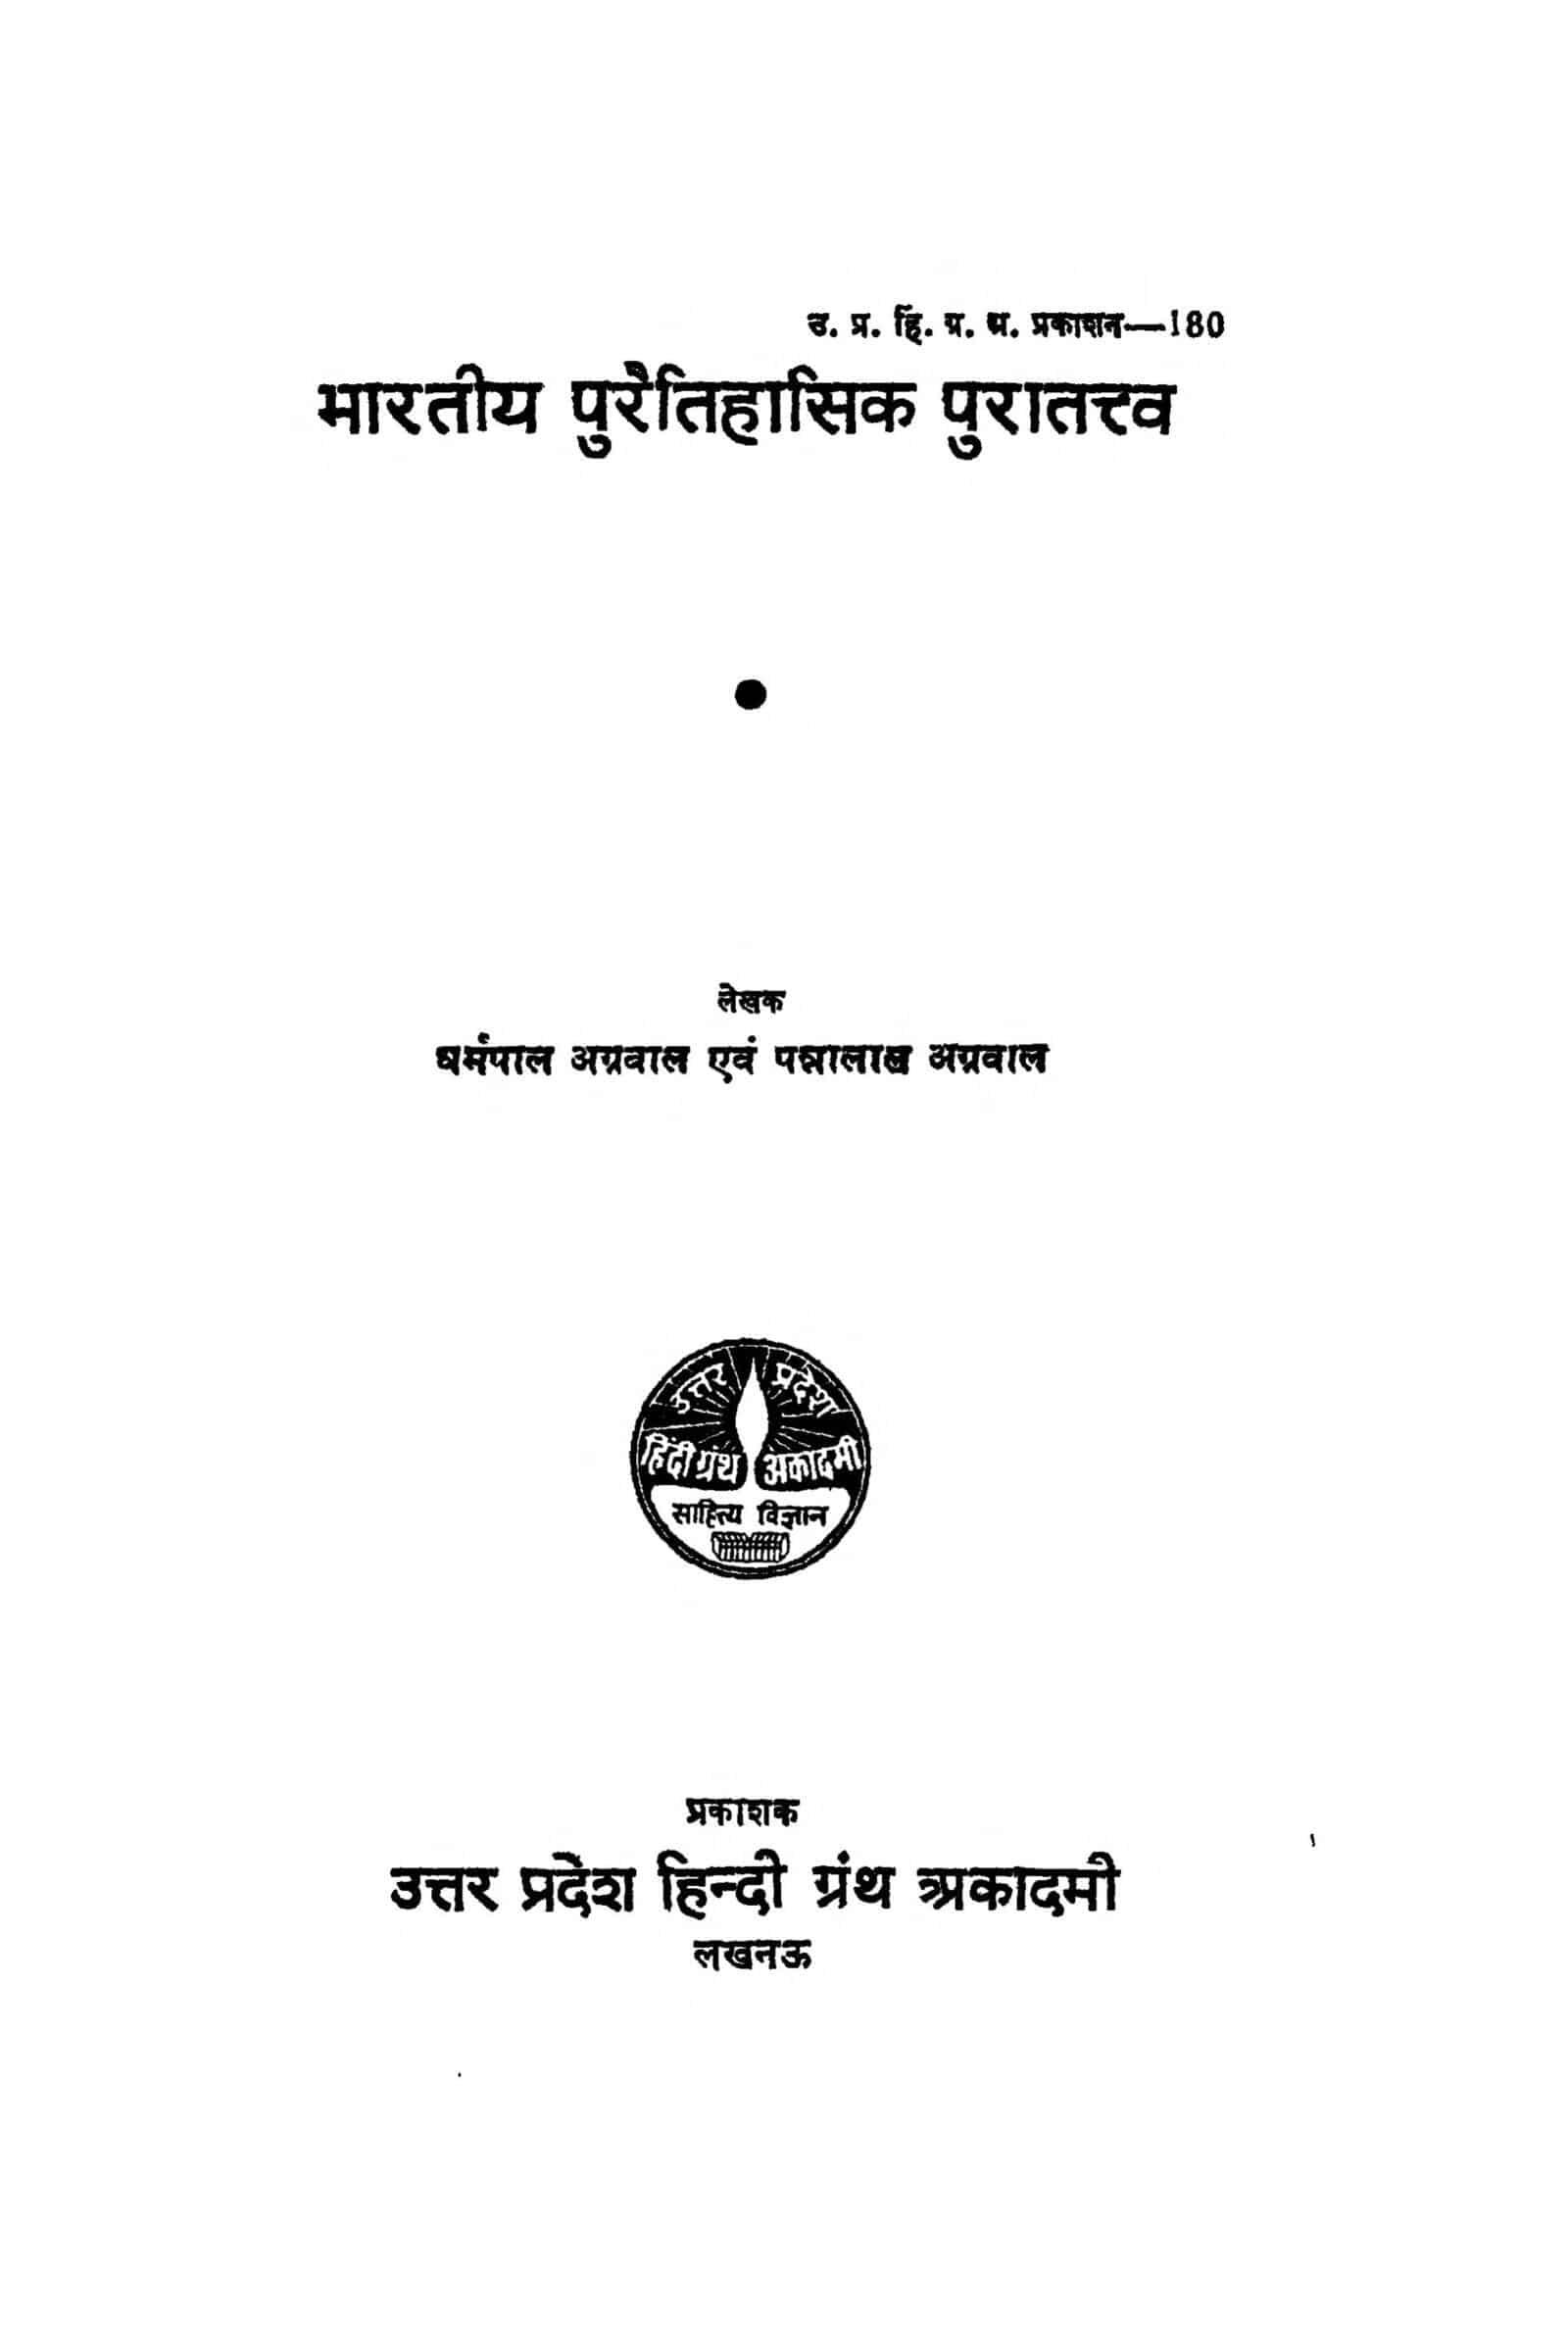 Book Image : भारतीय पुरैतिहासिक पुरातत्त्व - Bharatiy Puraitihasik Puratattv